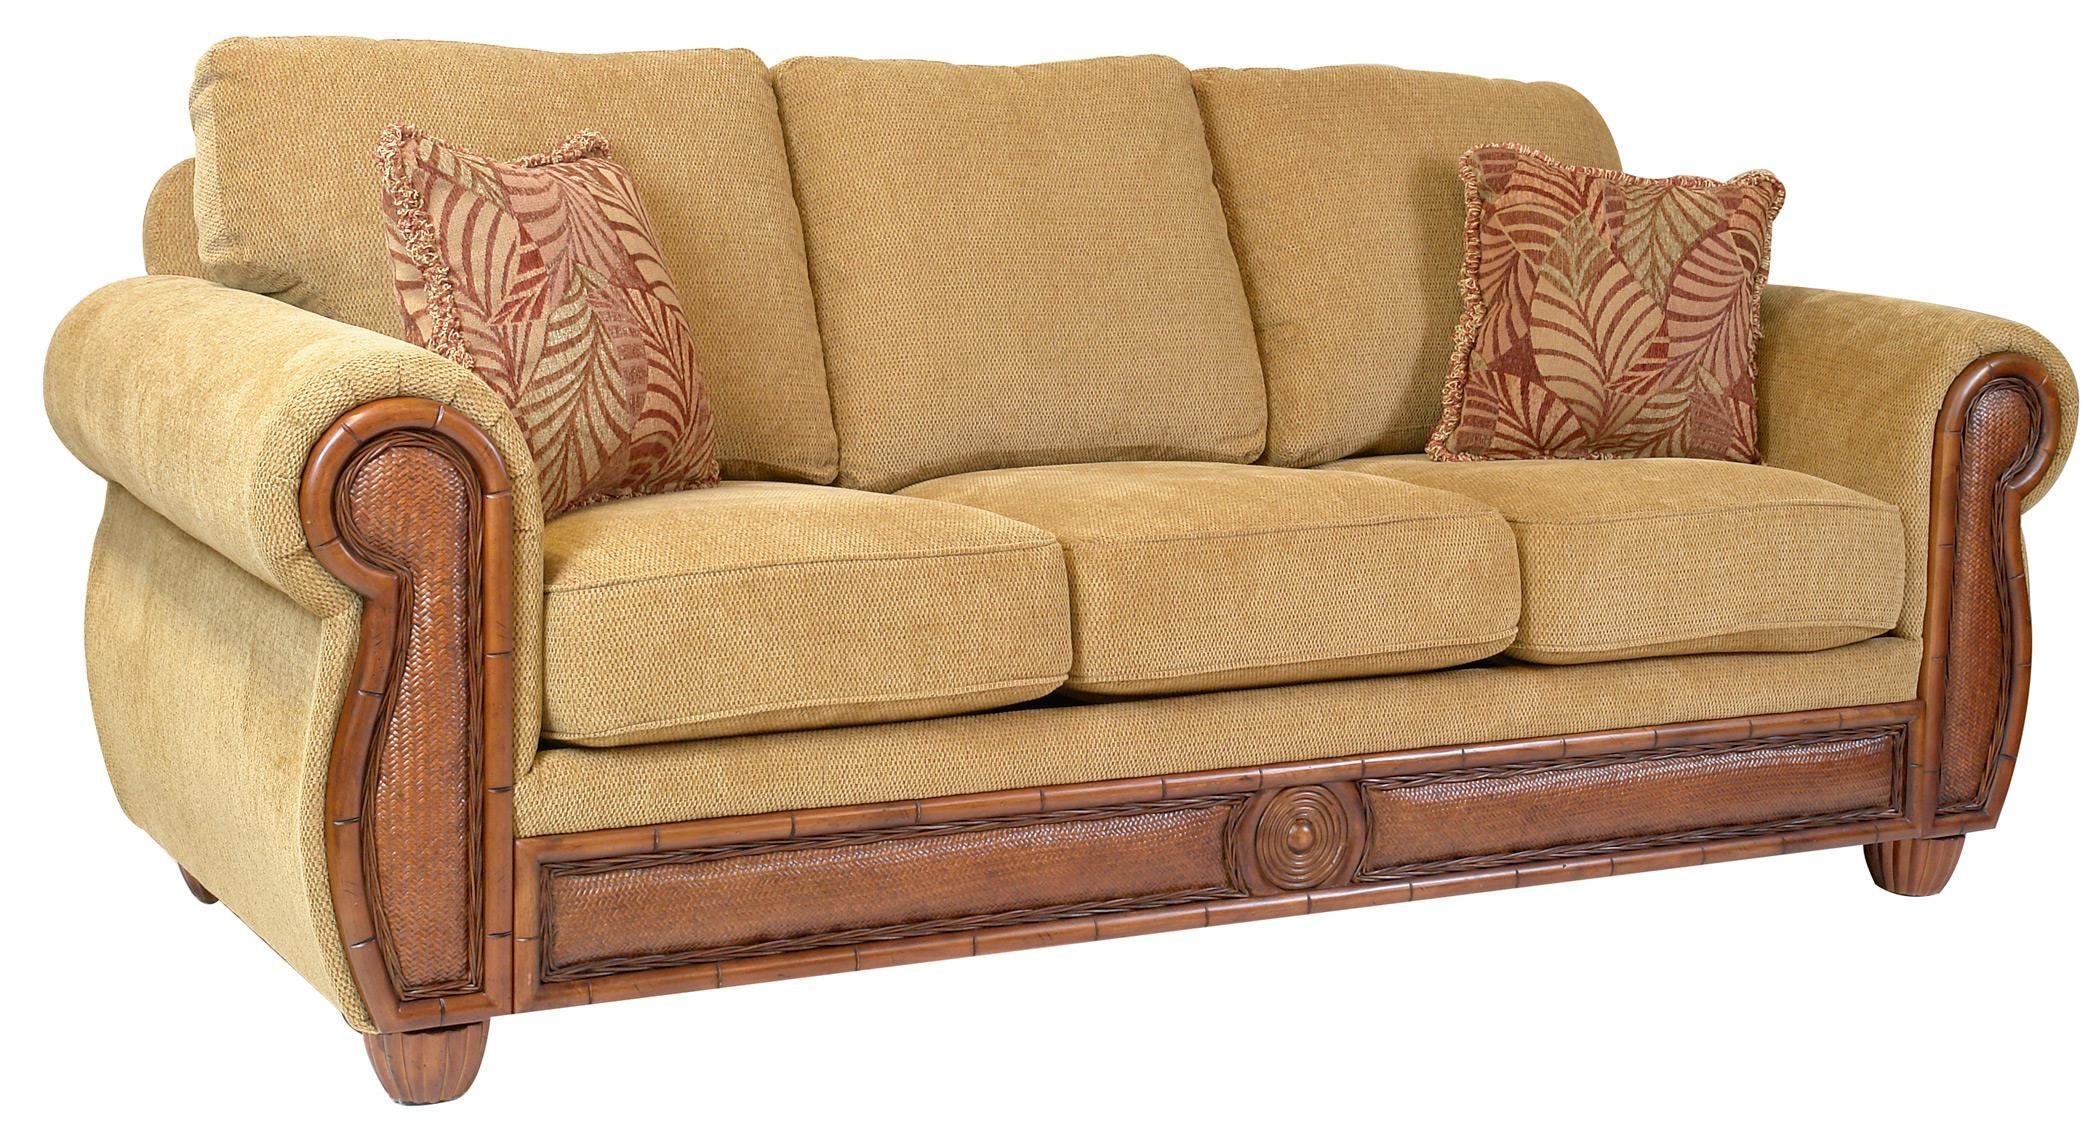 Key Largo Sofa by Synergy Home Furnishings Home